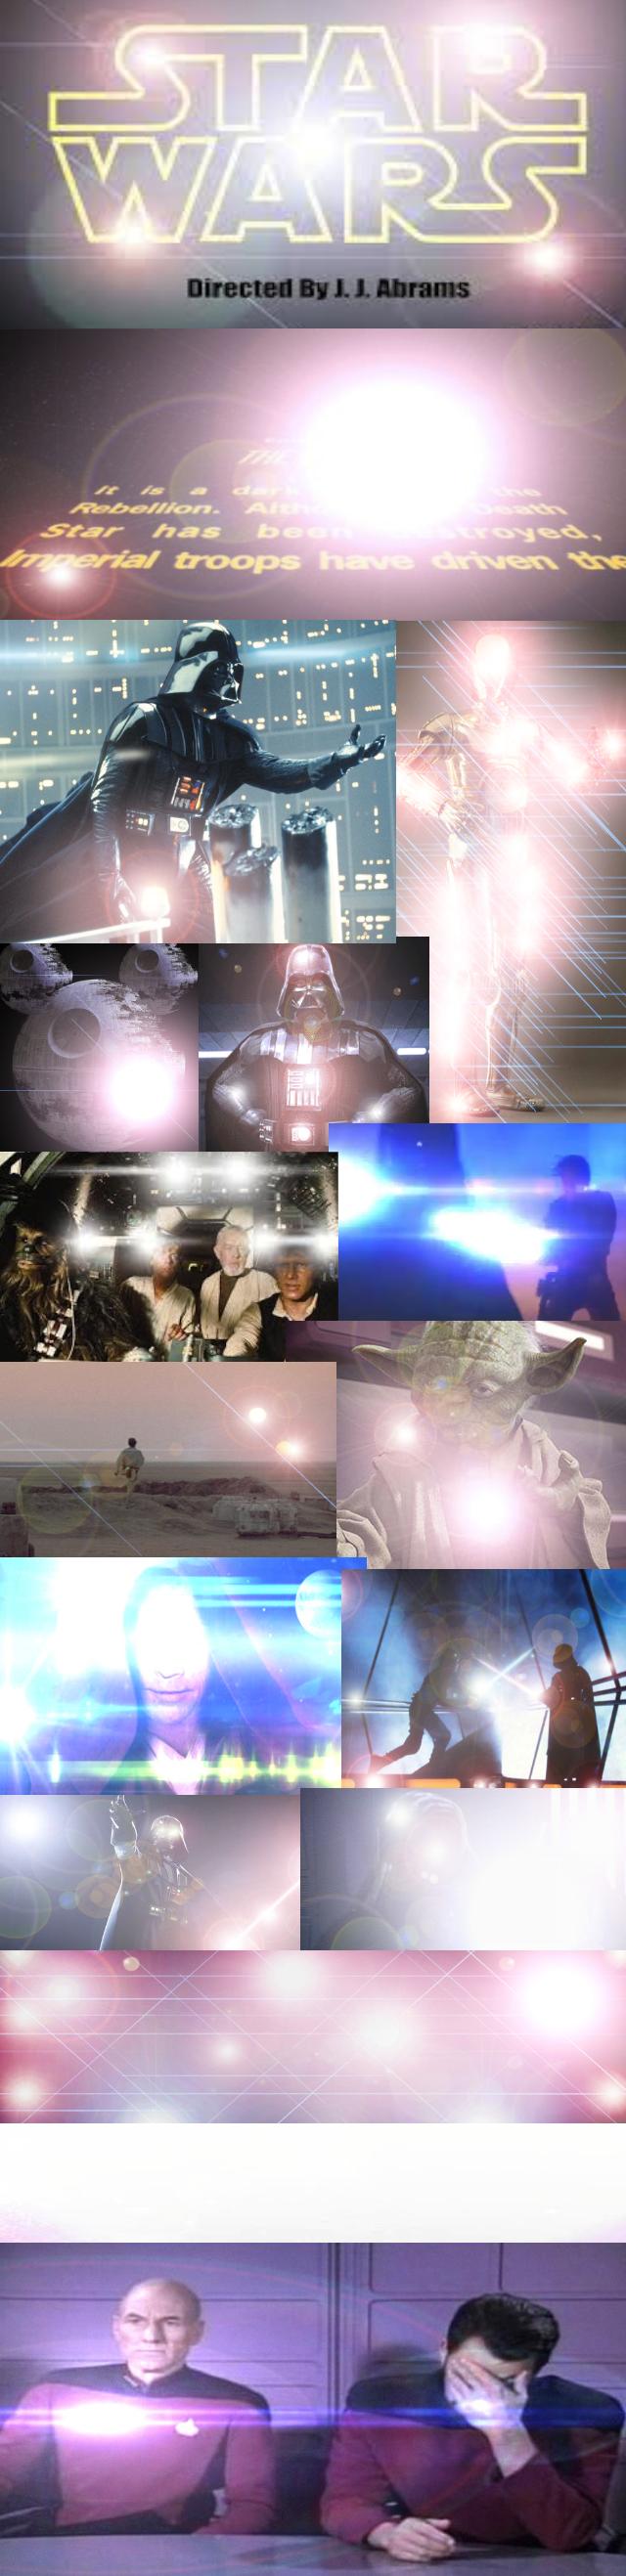 Star Wars Episode VII. I can't wait!.